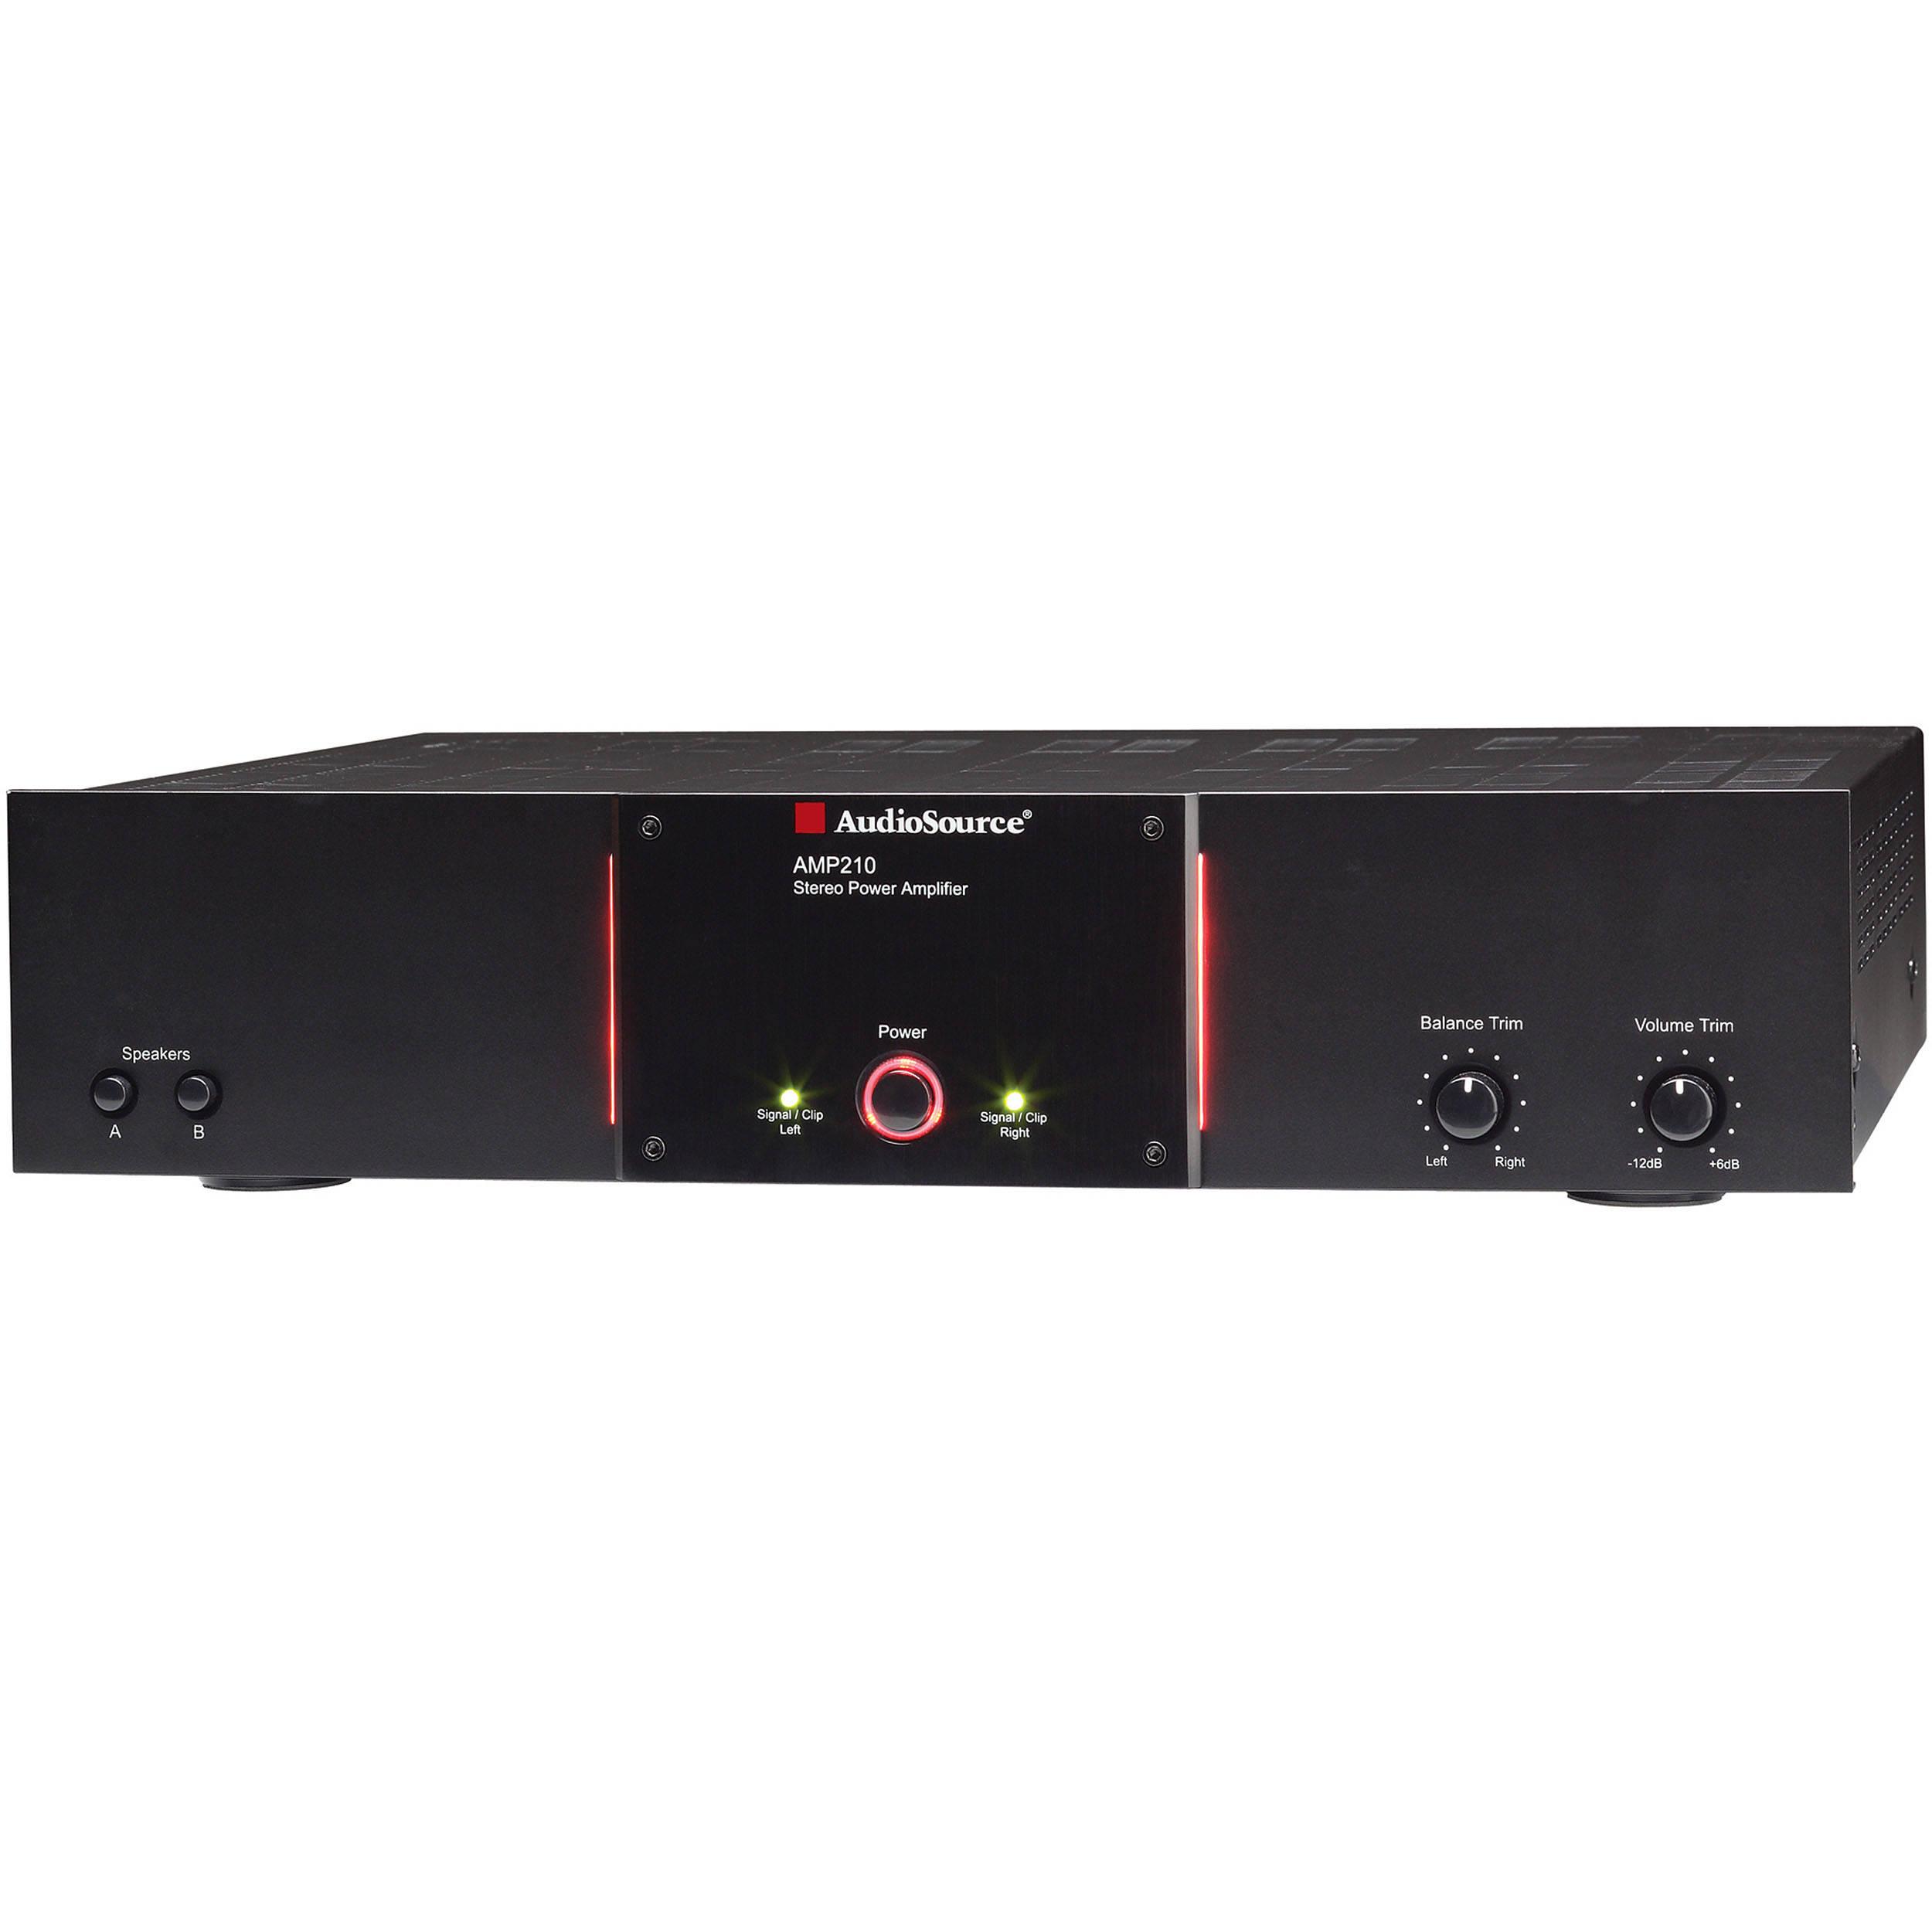 audiosource amp210 power amplifier amp 210 b h photo video. Black Bedroom Furniture Sets. Home Design Ideas